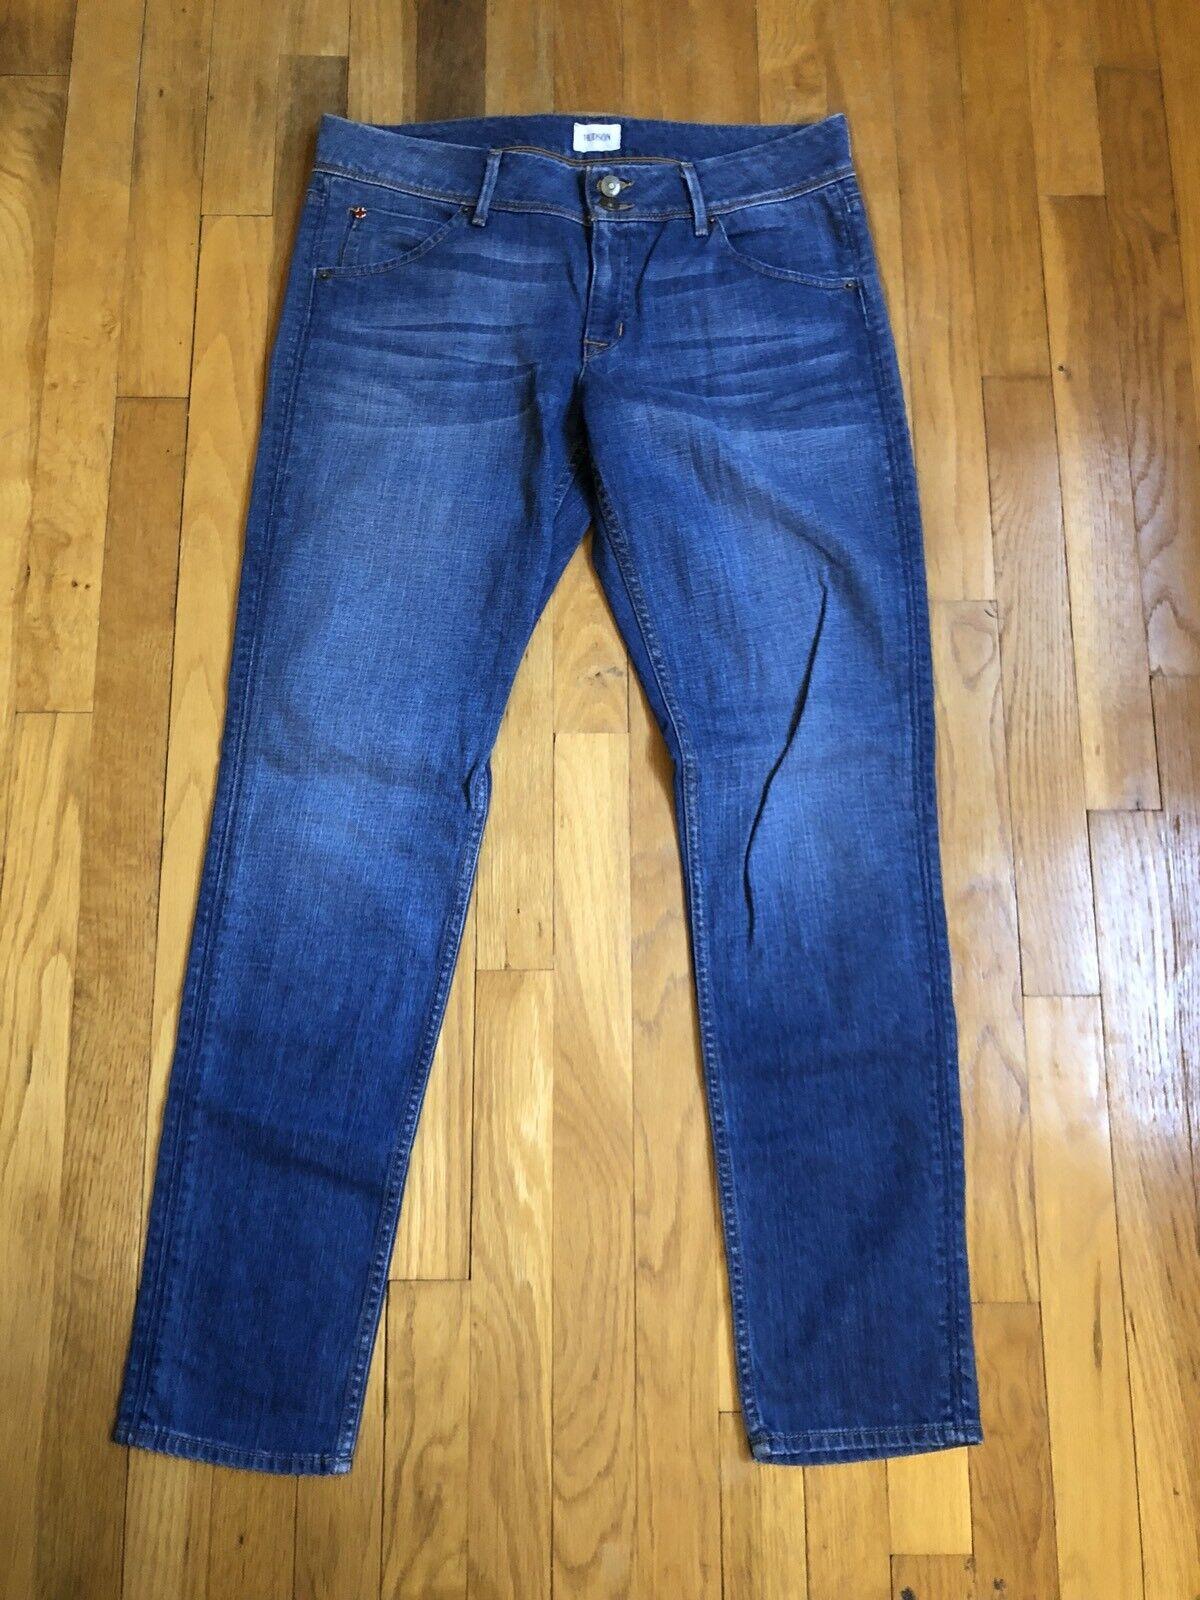 Hudson Jeans Collin Skinny Jeans 31